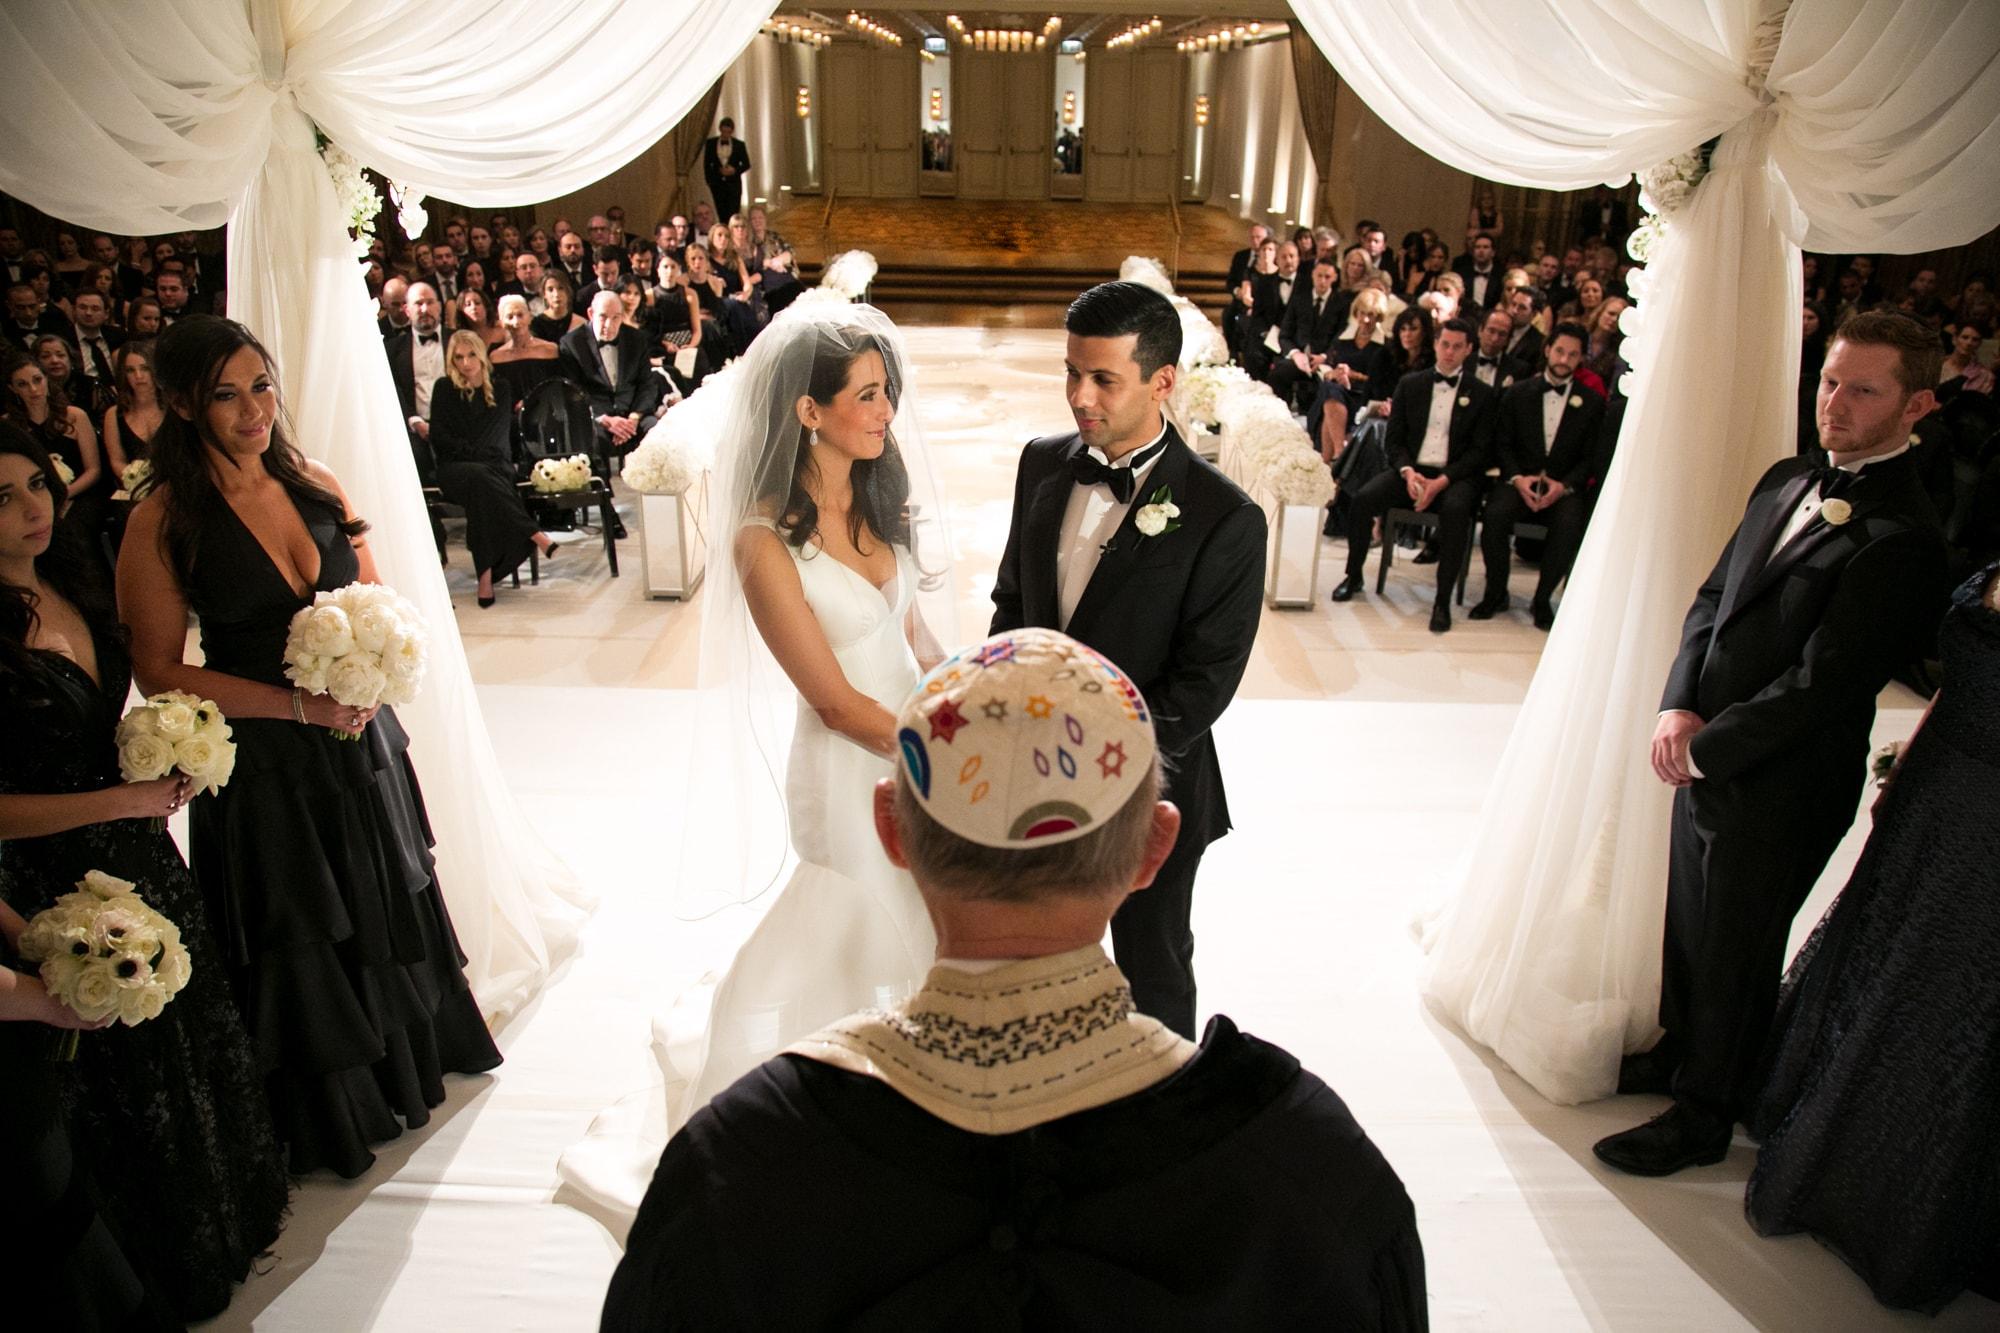 Pretty huppa photograph during wedding ceremony